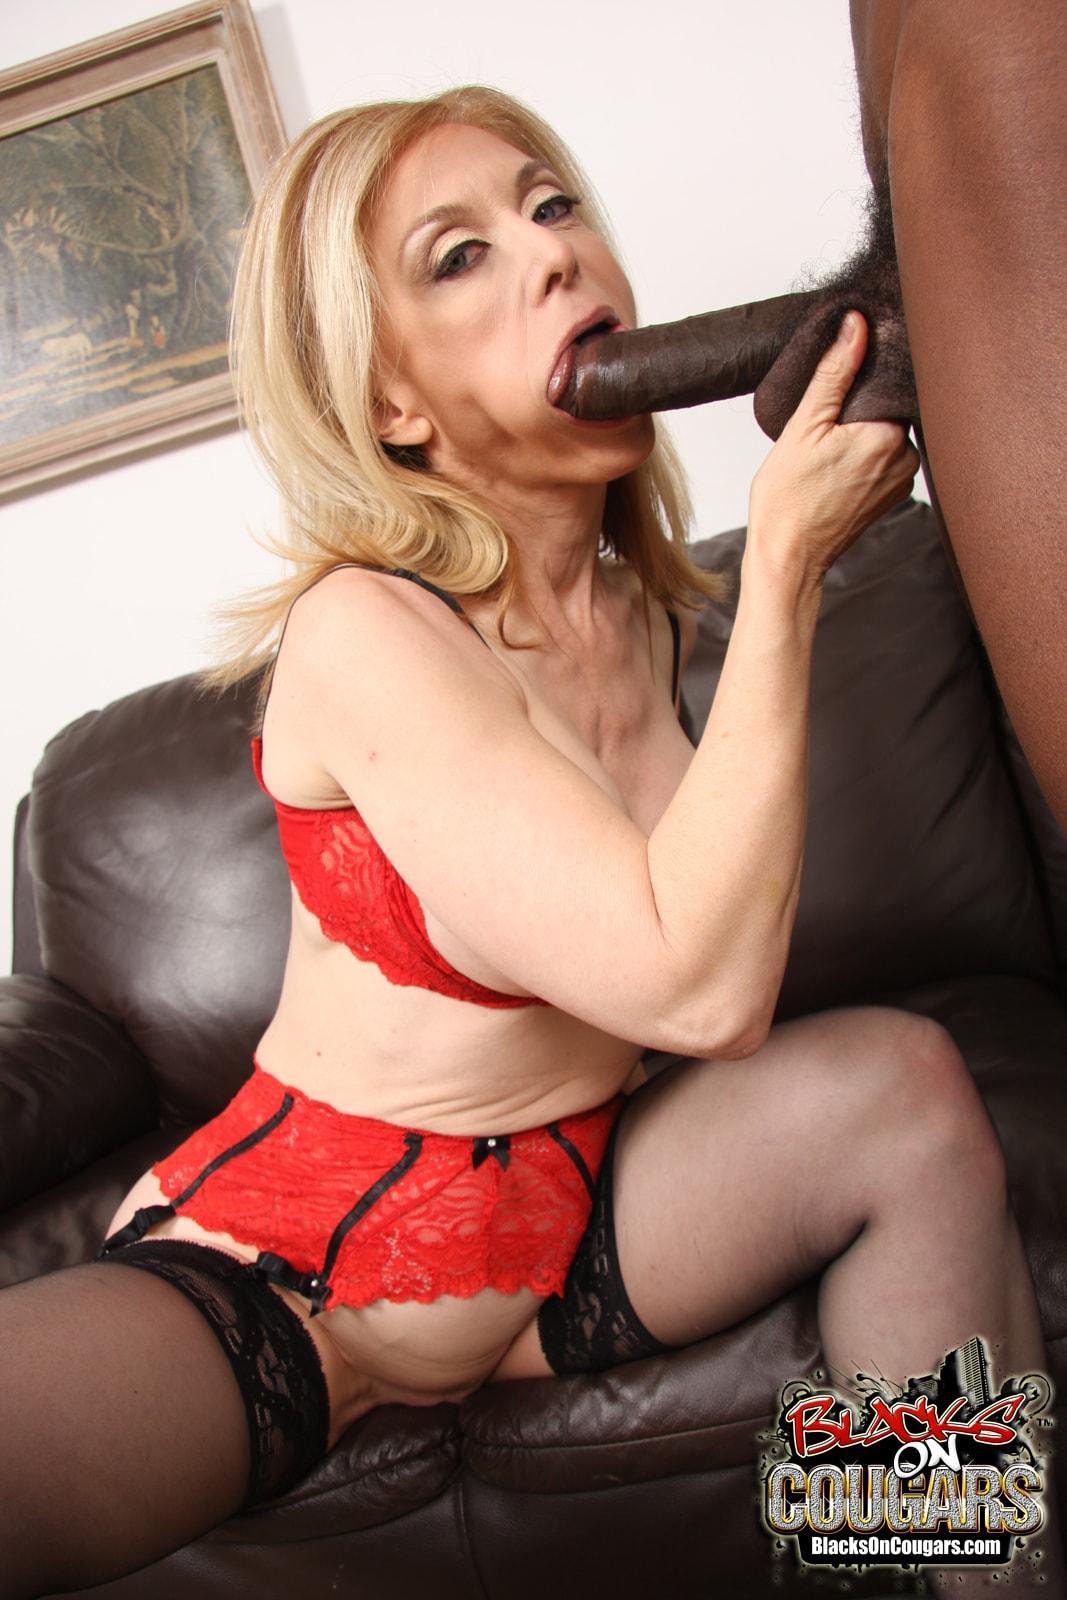 Dogfart '- Blacks On Cougars' starring Nina Hartley (Photo 18)